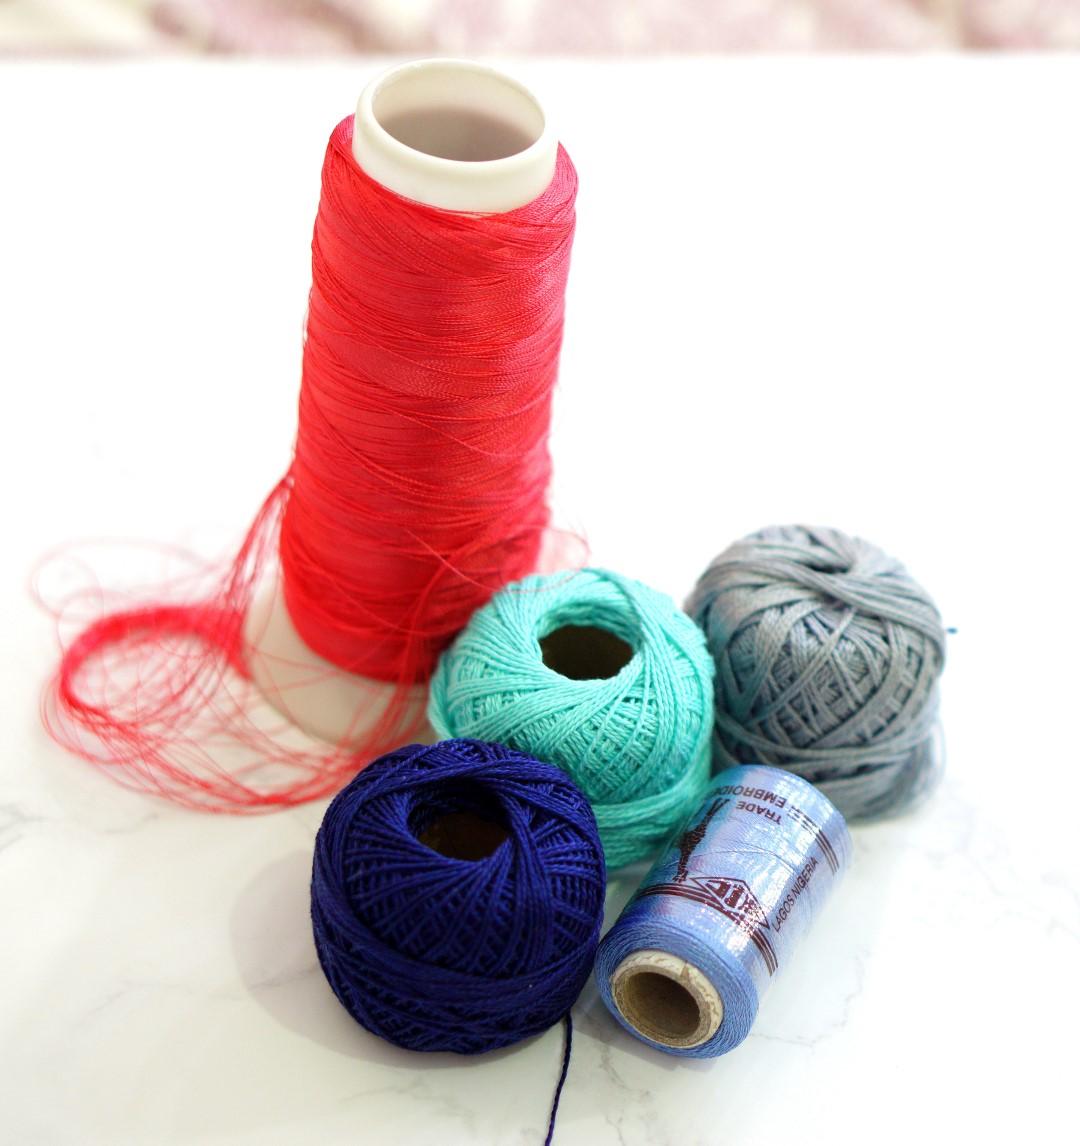 tassel earrings trend diy - embroidery threads